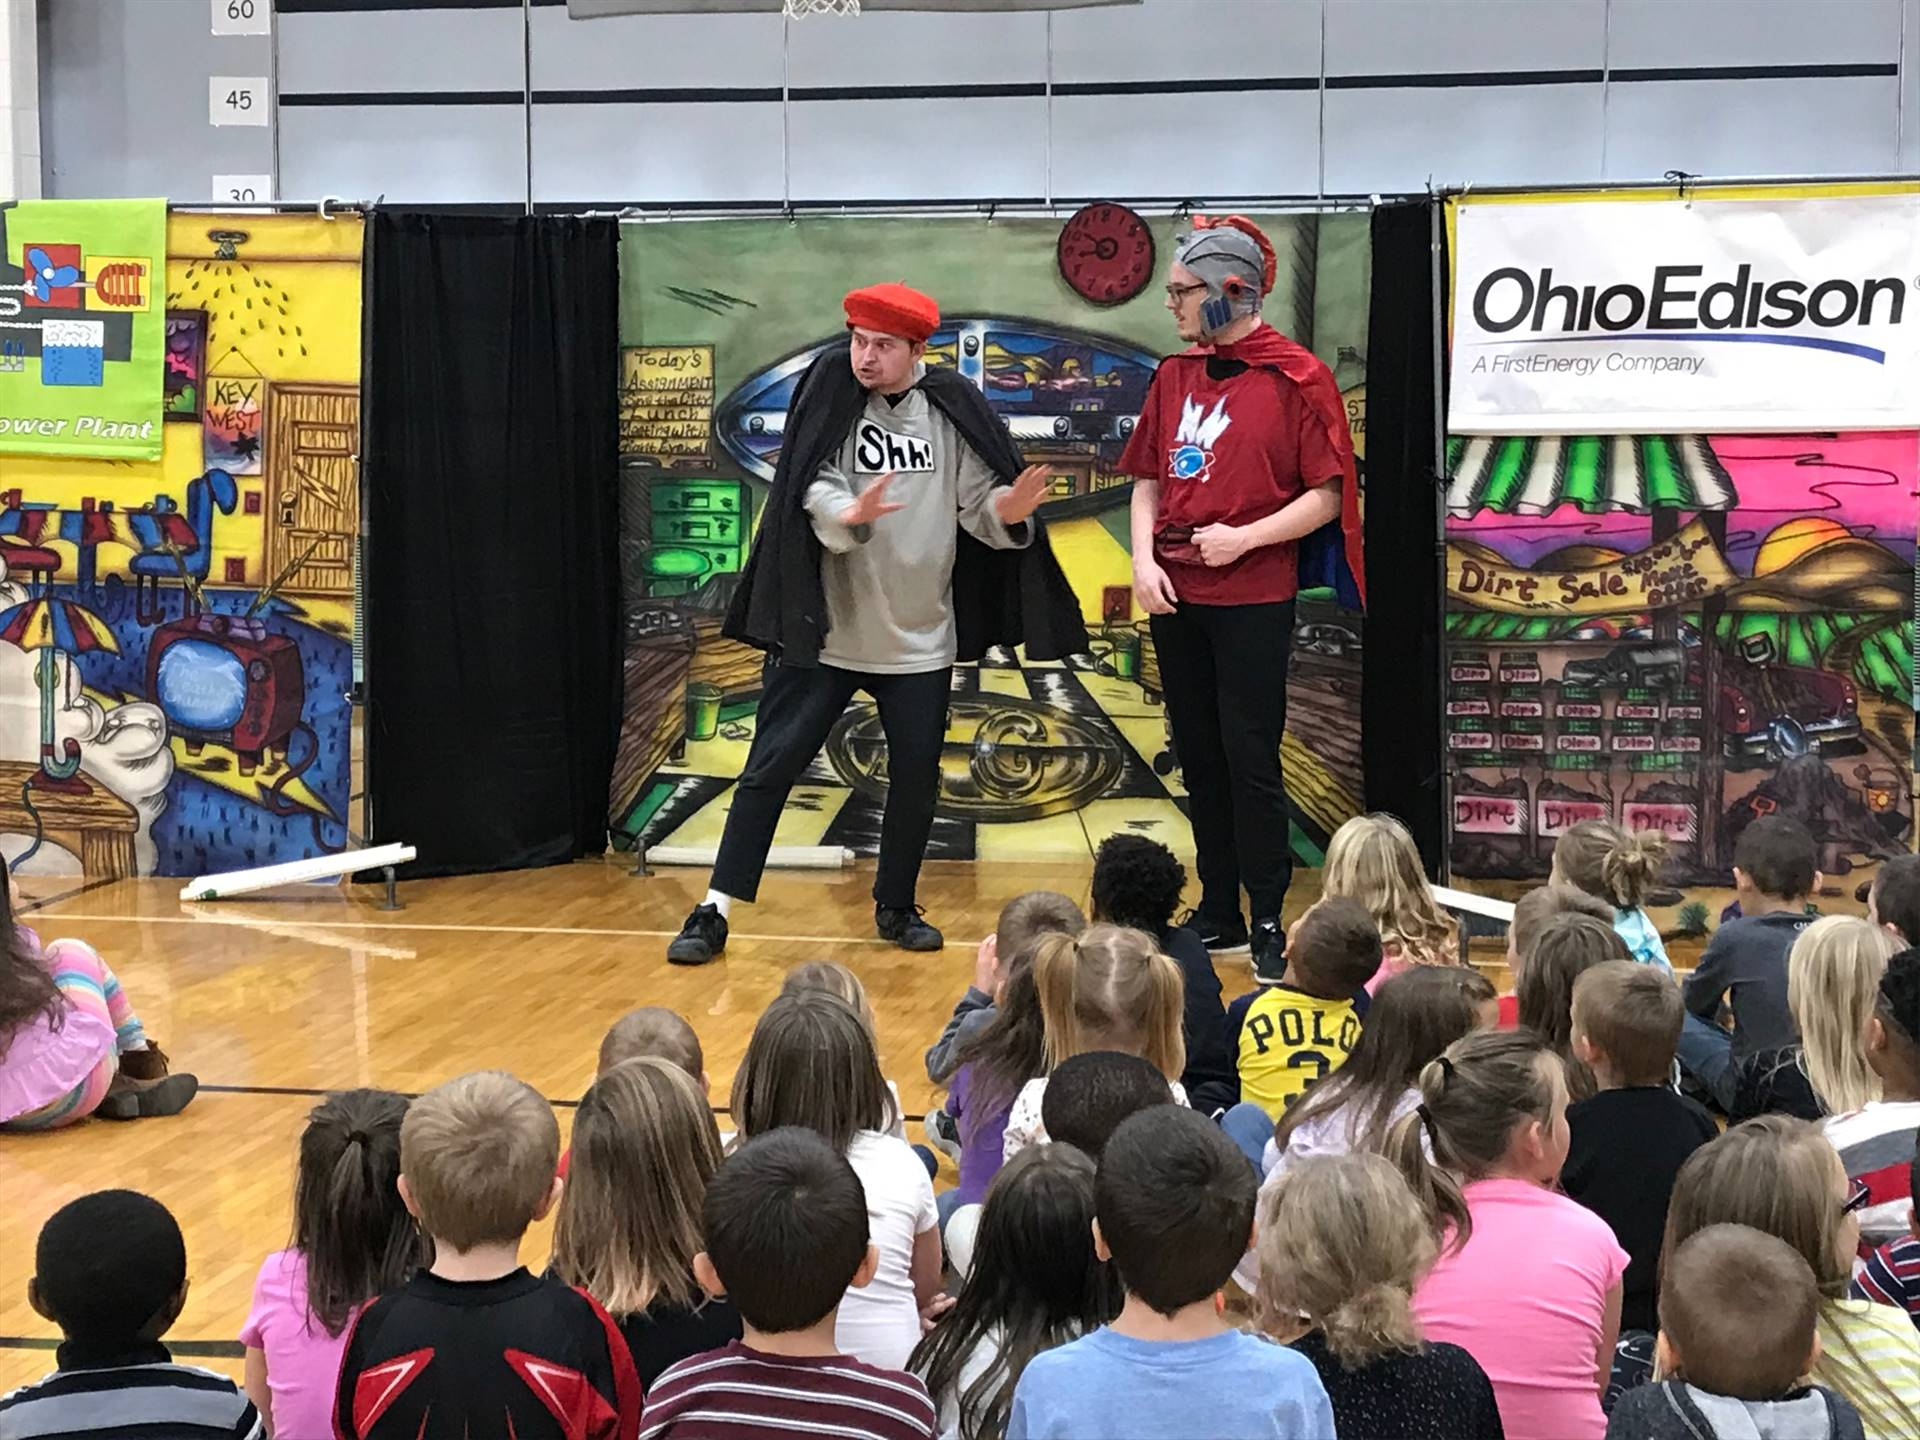 National Children's Theater performance